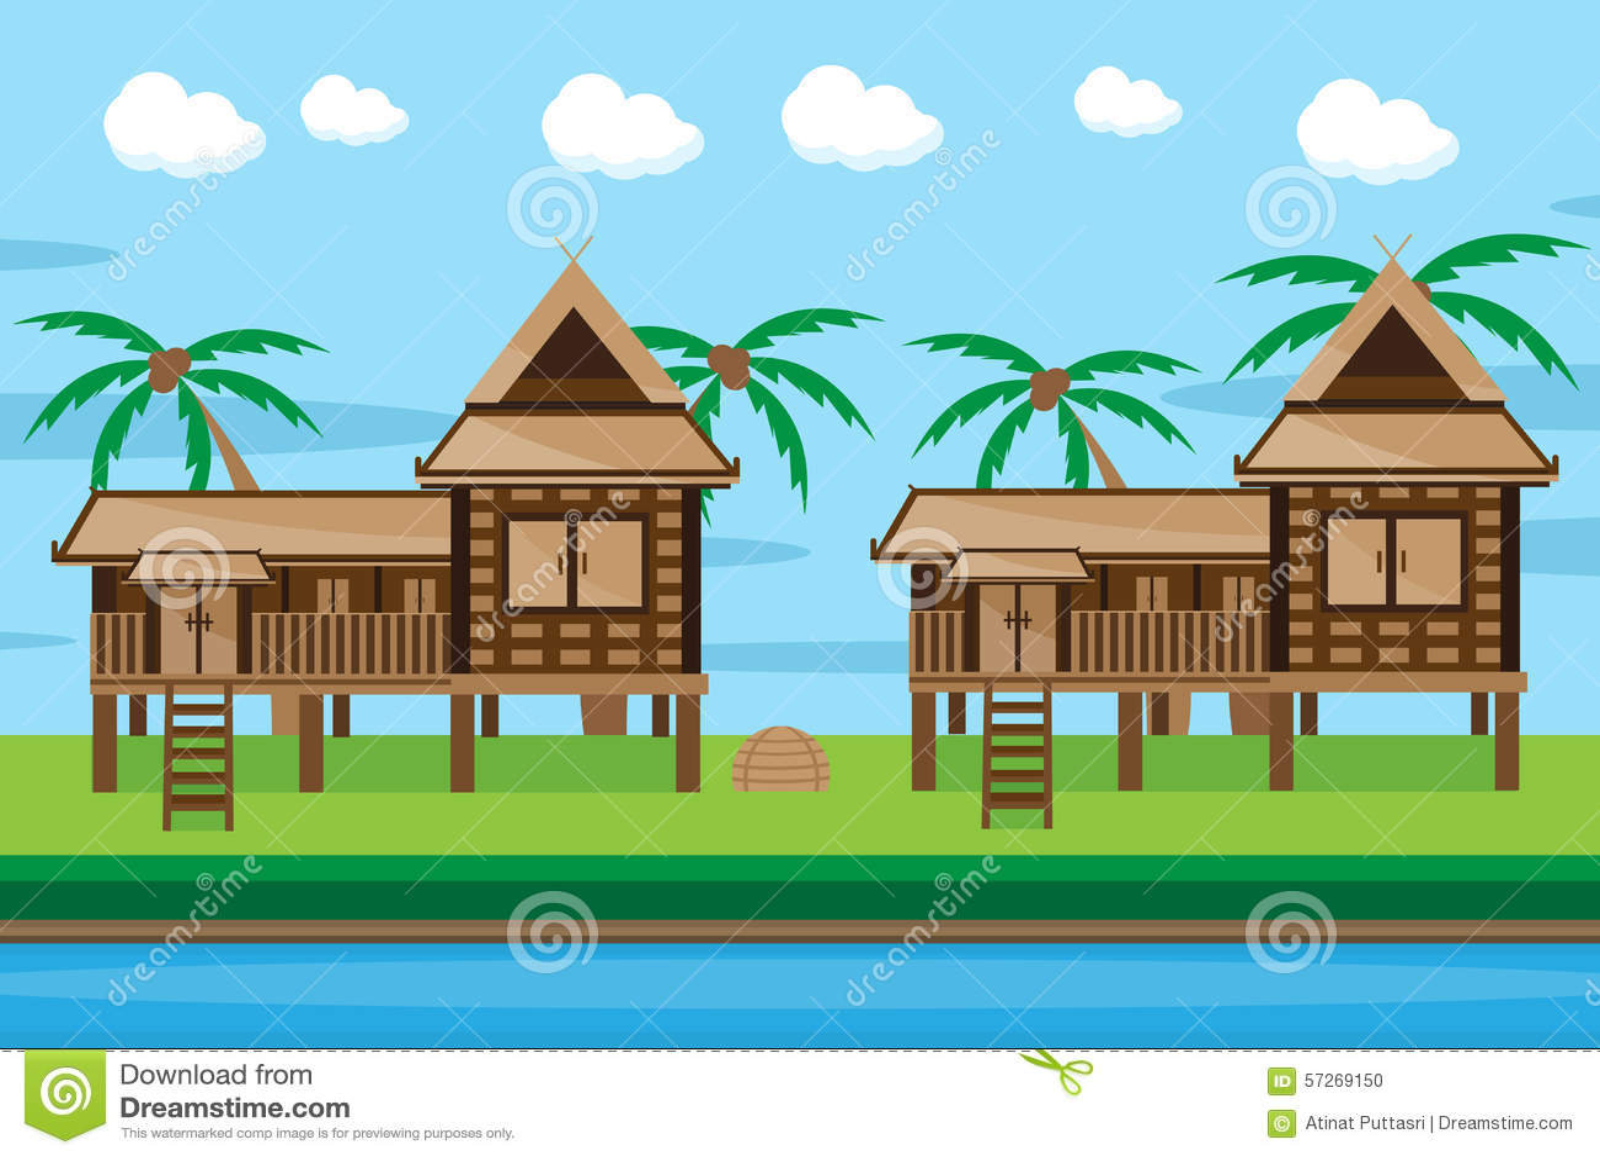 Thai house design stock vector image 57269150 for Thai home designs